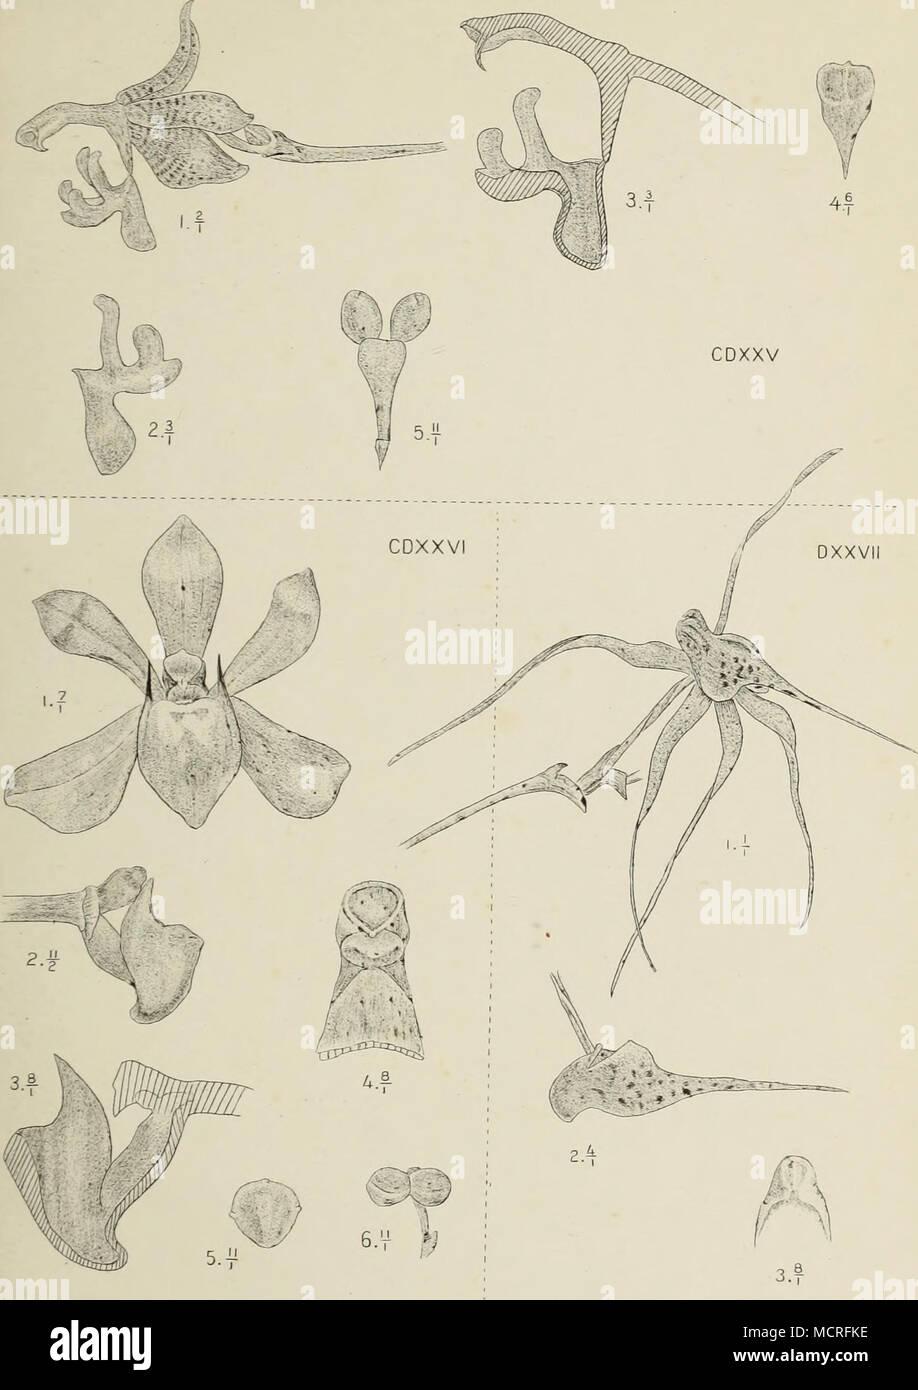 . J.J.Smith del. M Kromohardjo litb. cdxxv. Sarcochilus appendiculatus J.J.S. cdxxv/. Bogoria Raciborskü J.J.S. cdxxv//. Thrixspermum ncuminatissimiim Bchh.f. - Stock Image